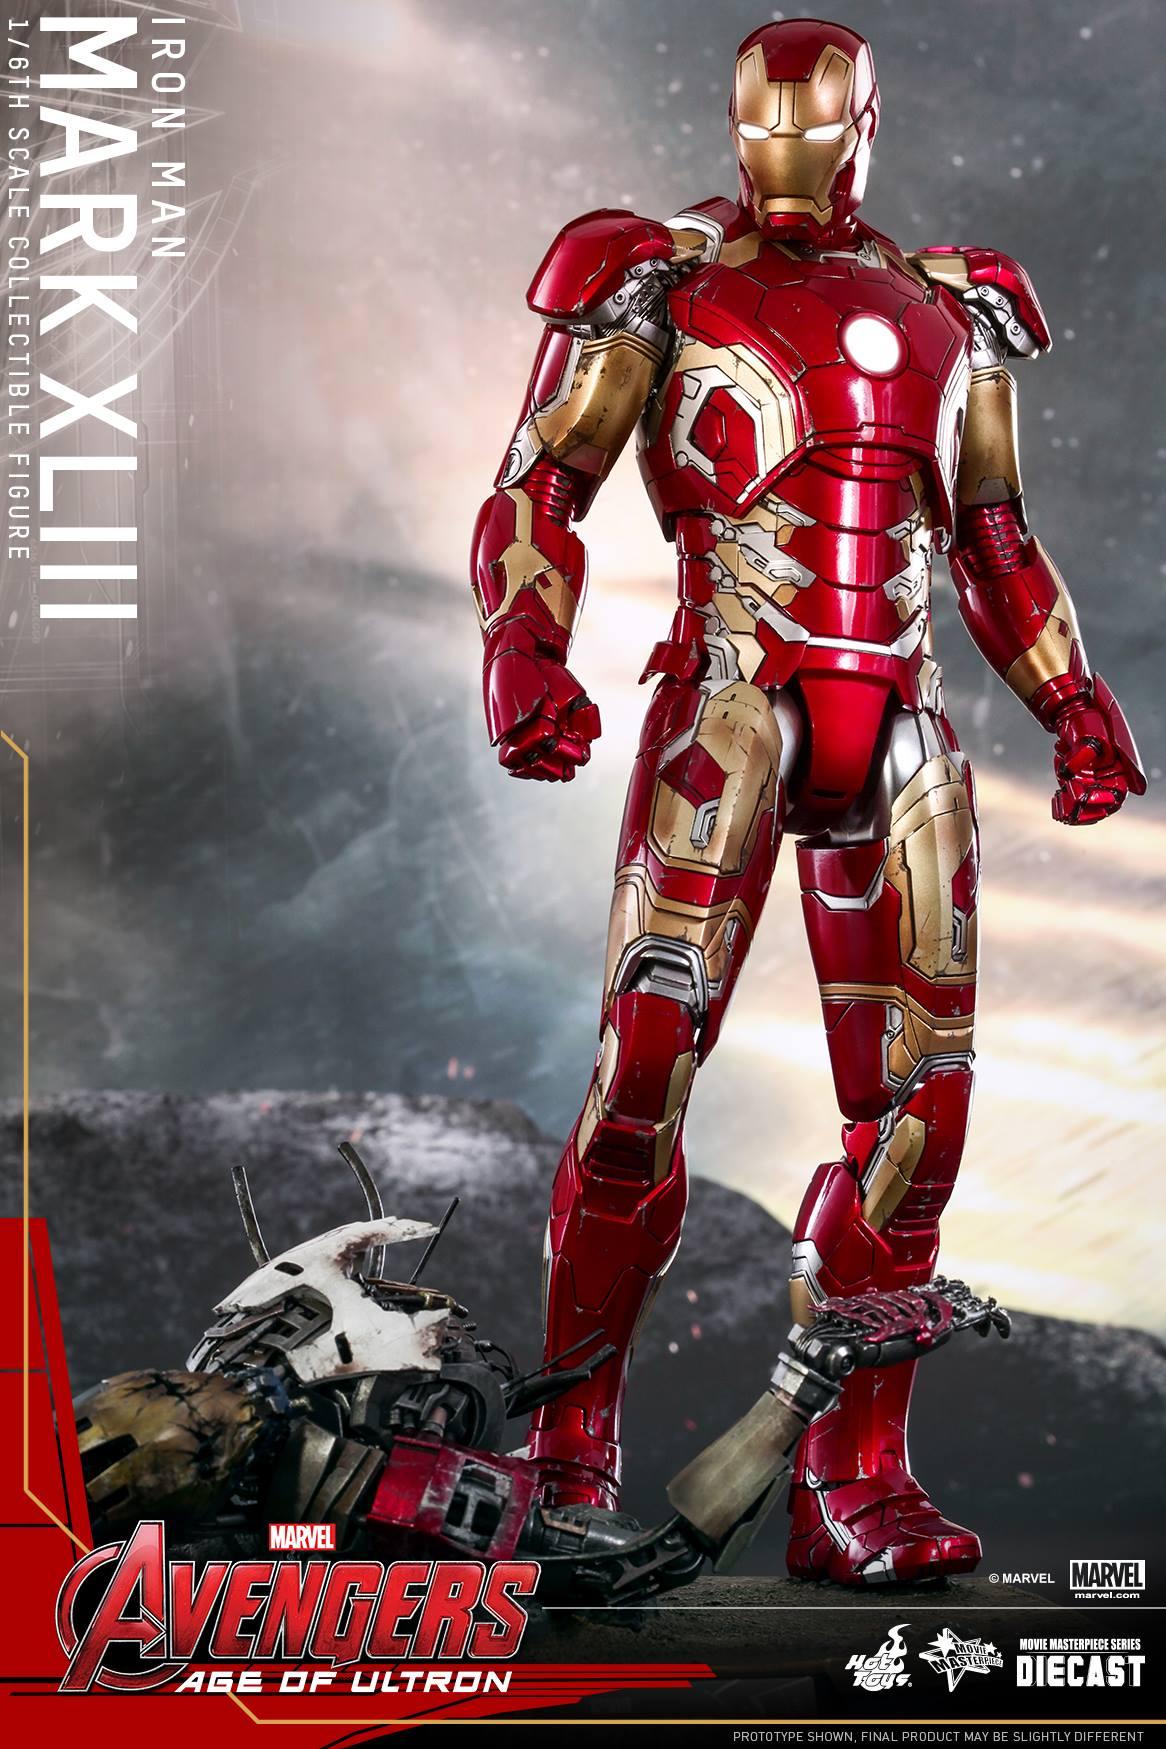 Hot toys 39 avengers age of ultron iron man suit revealed - Images avengers ...